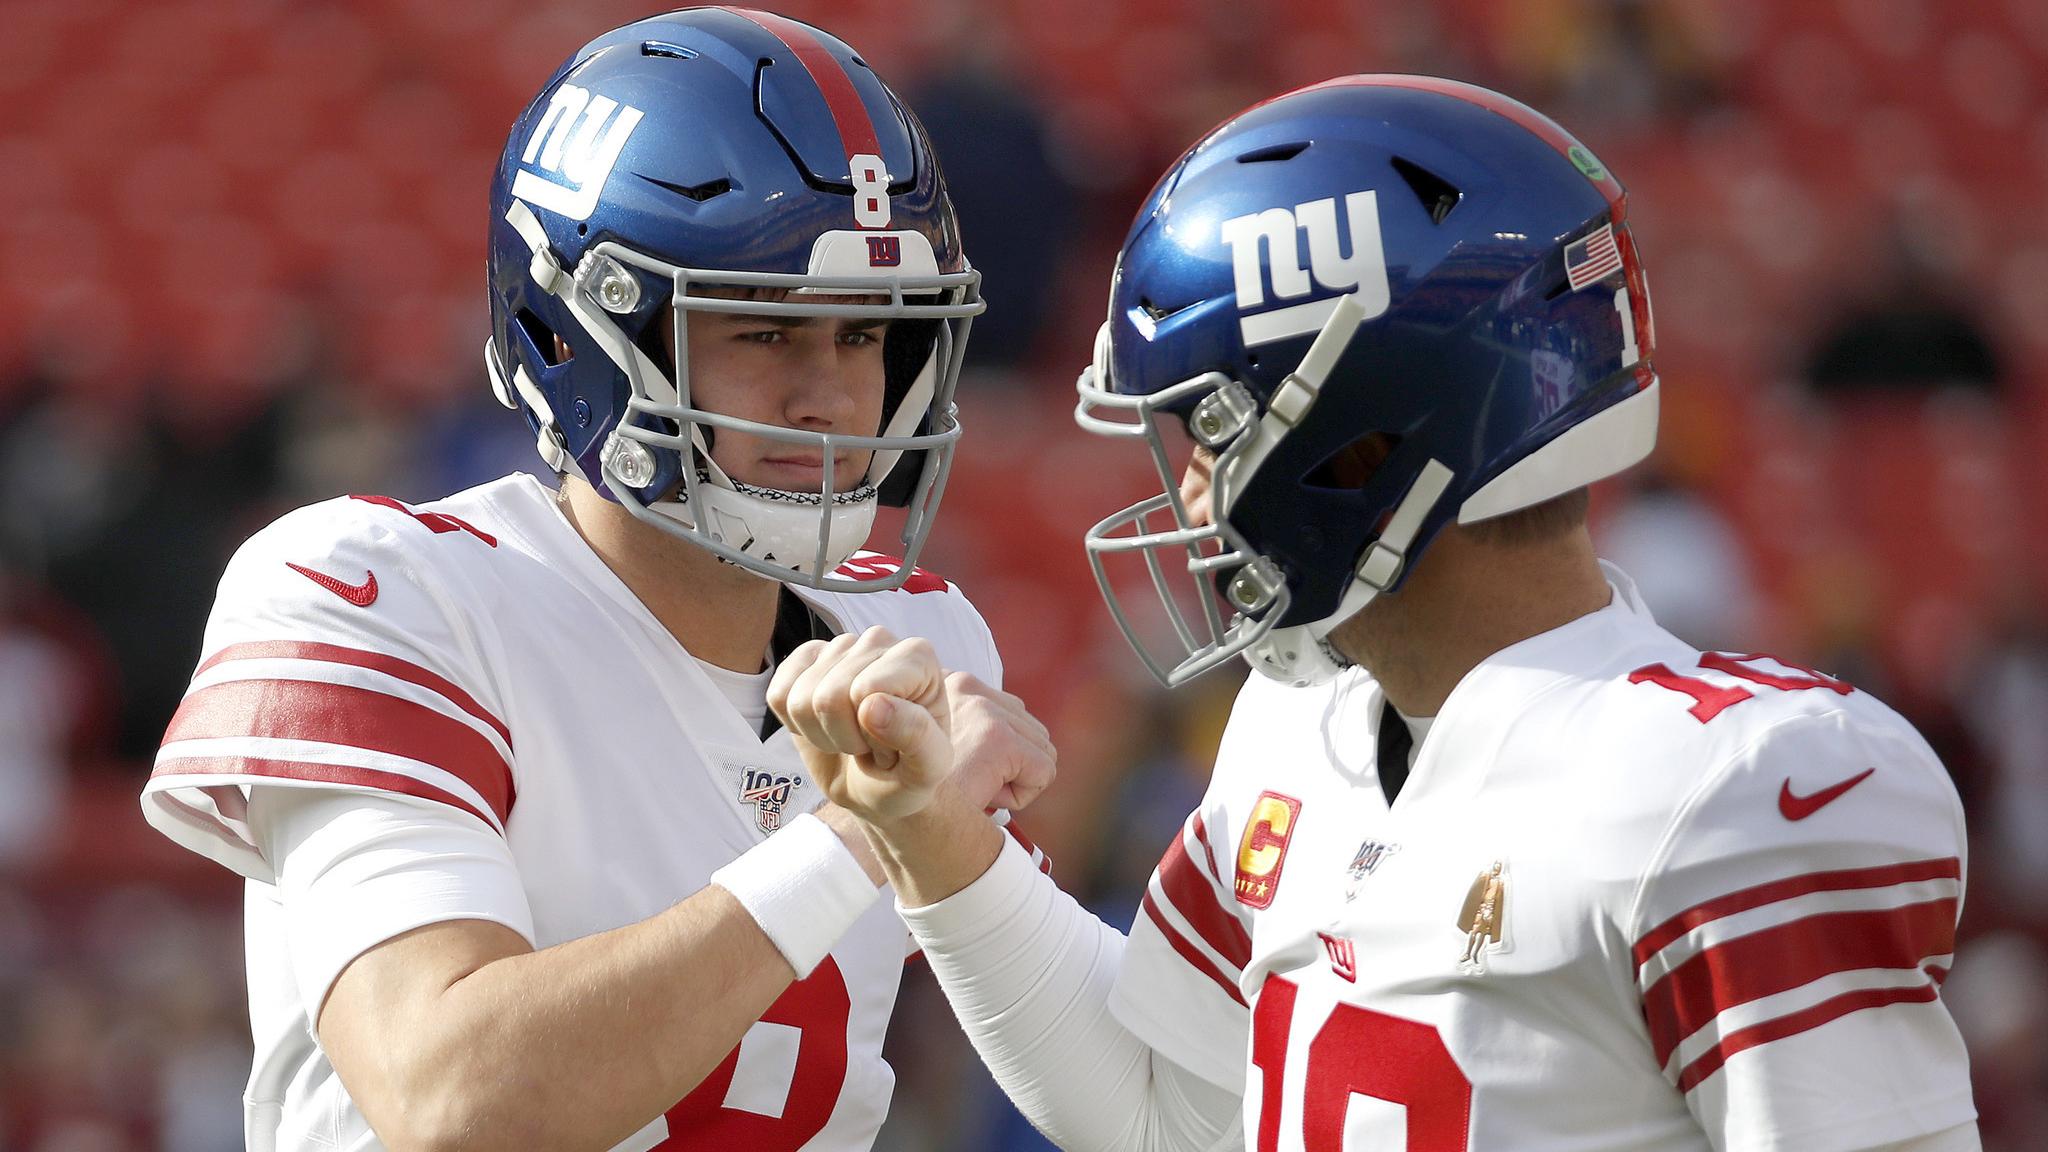 New York Giants All In Challenge